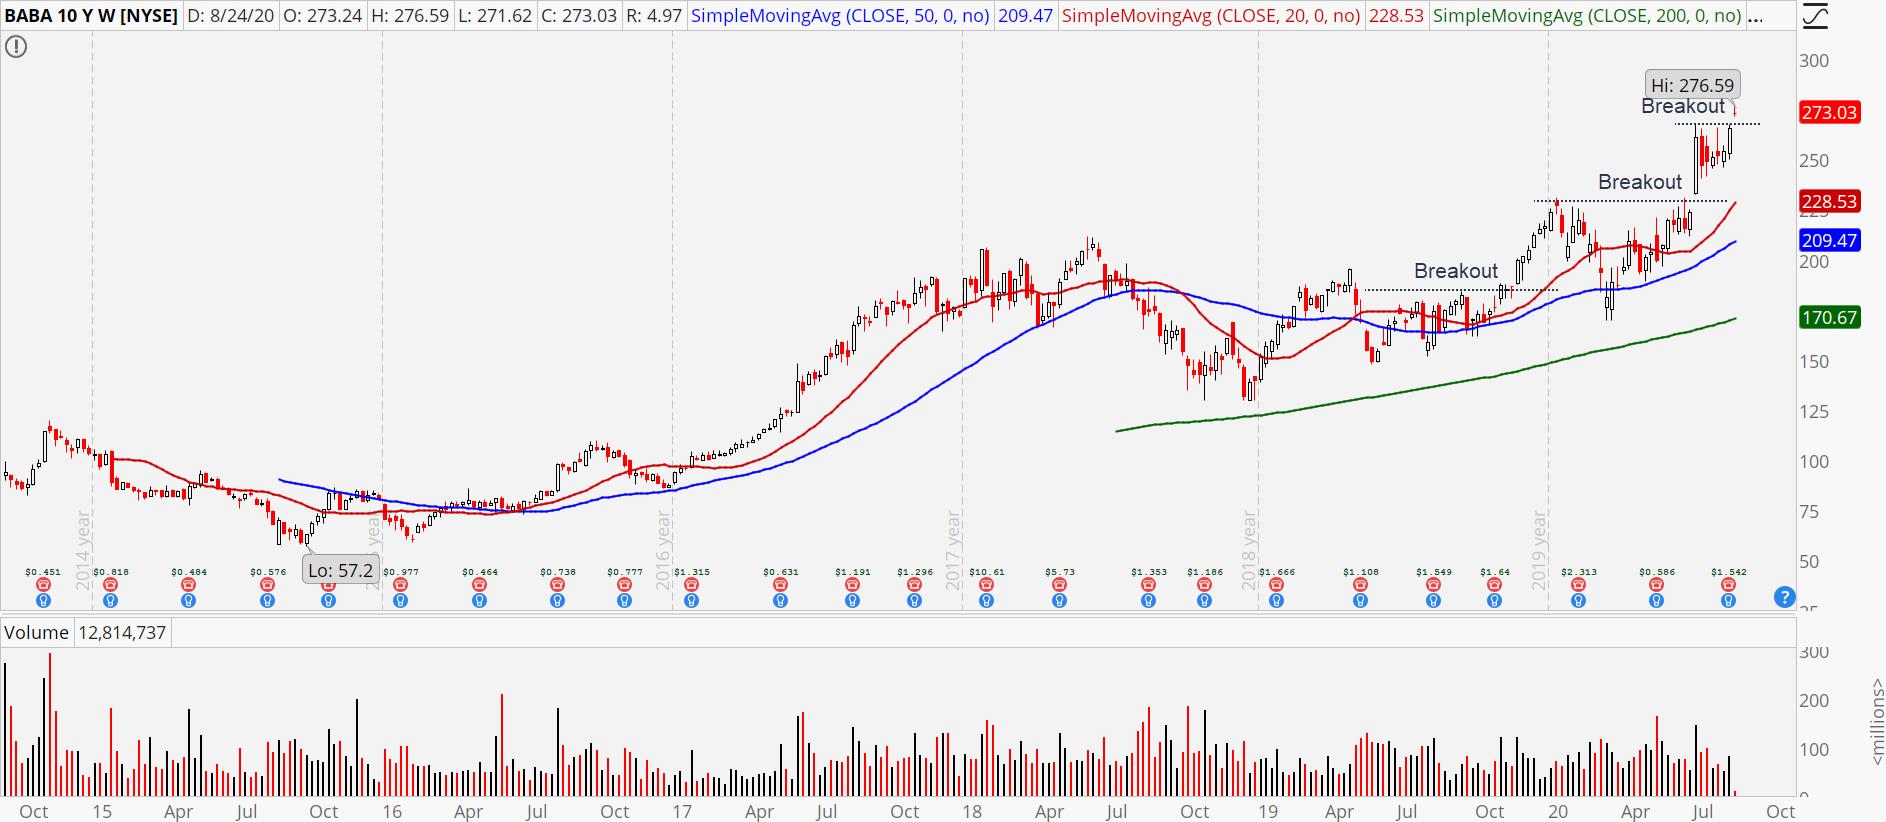 Alibaba (BABA) weekly chart showing breakout history